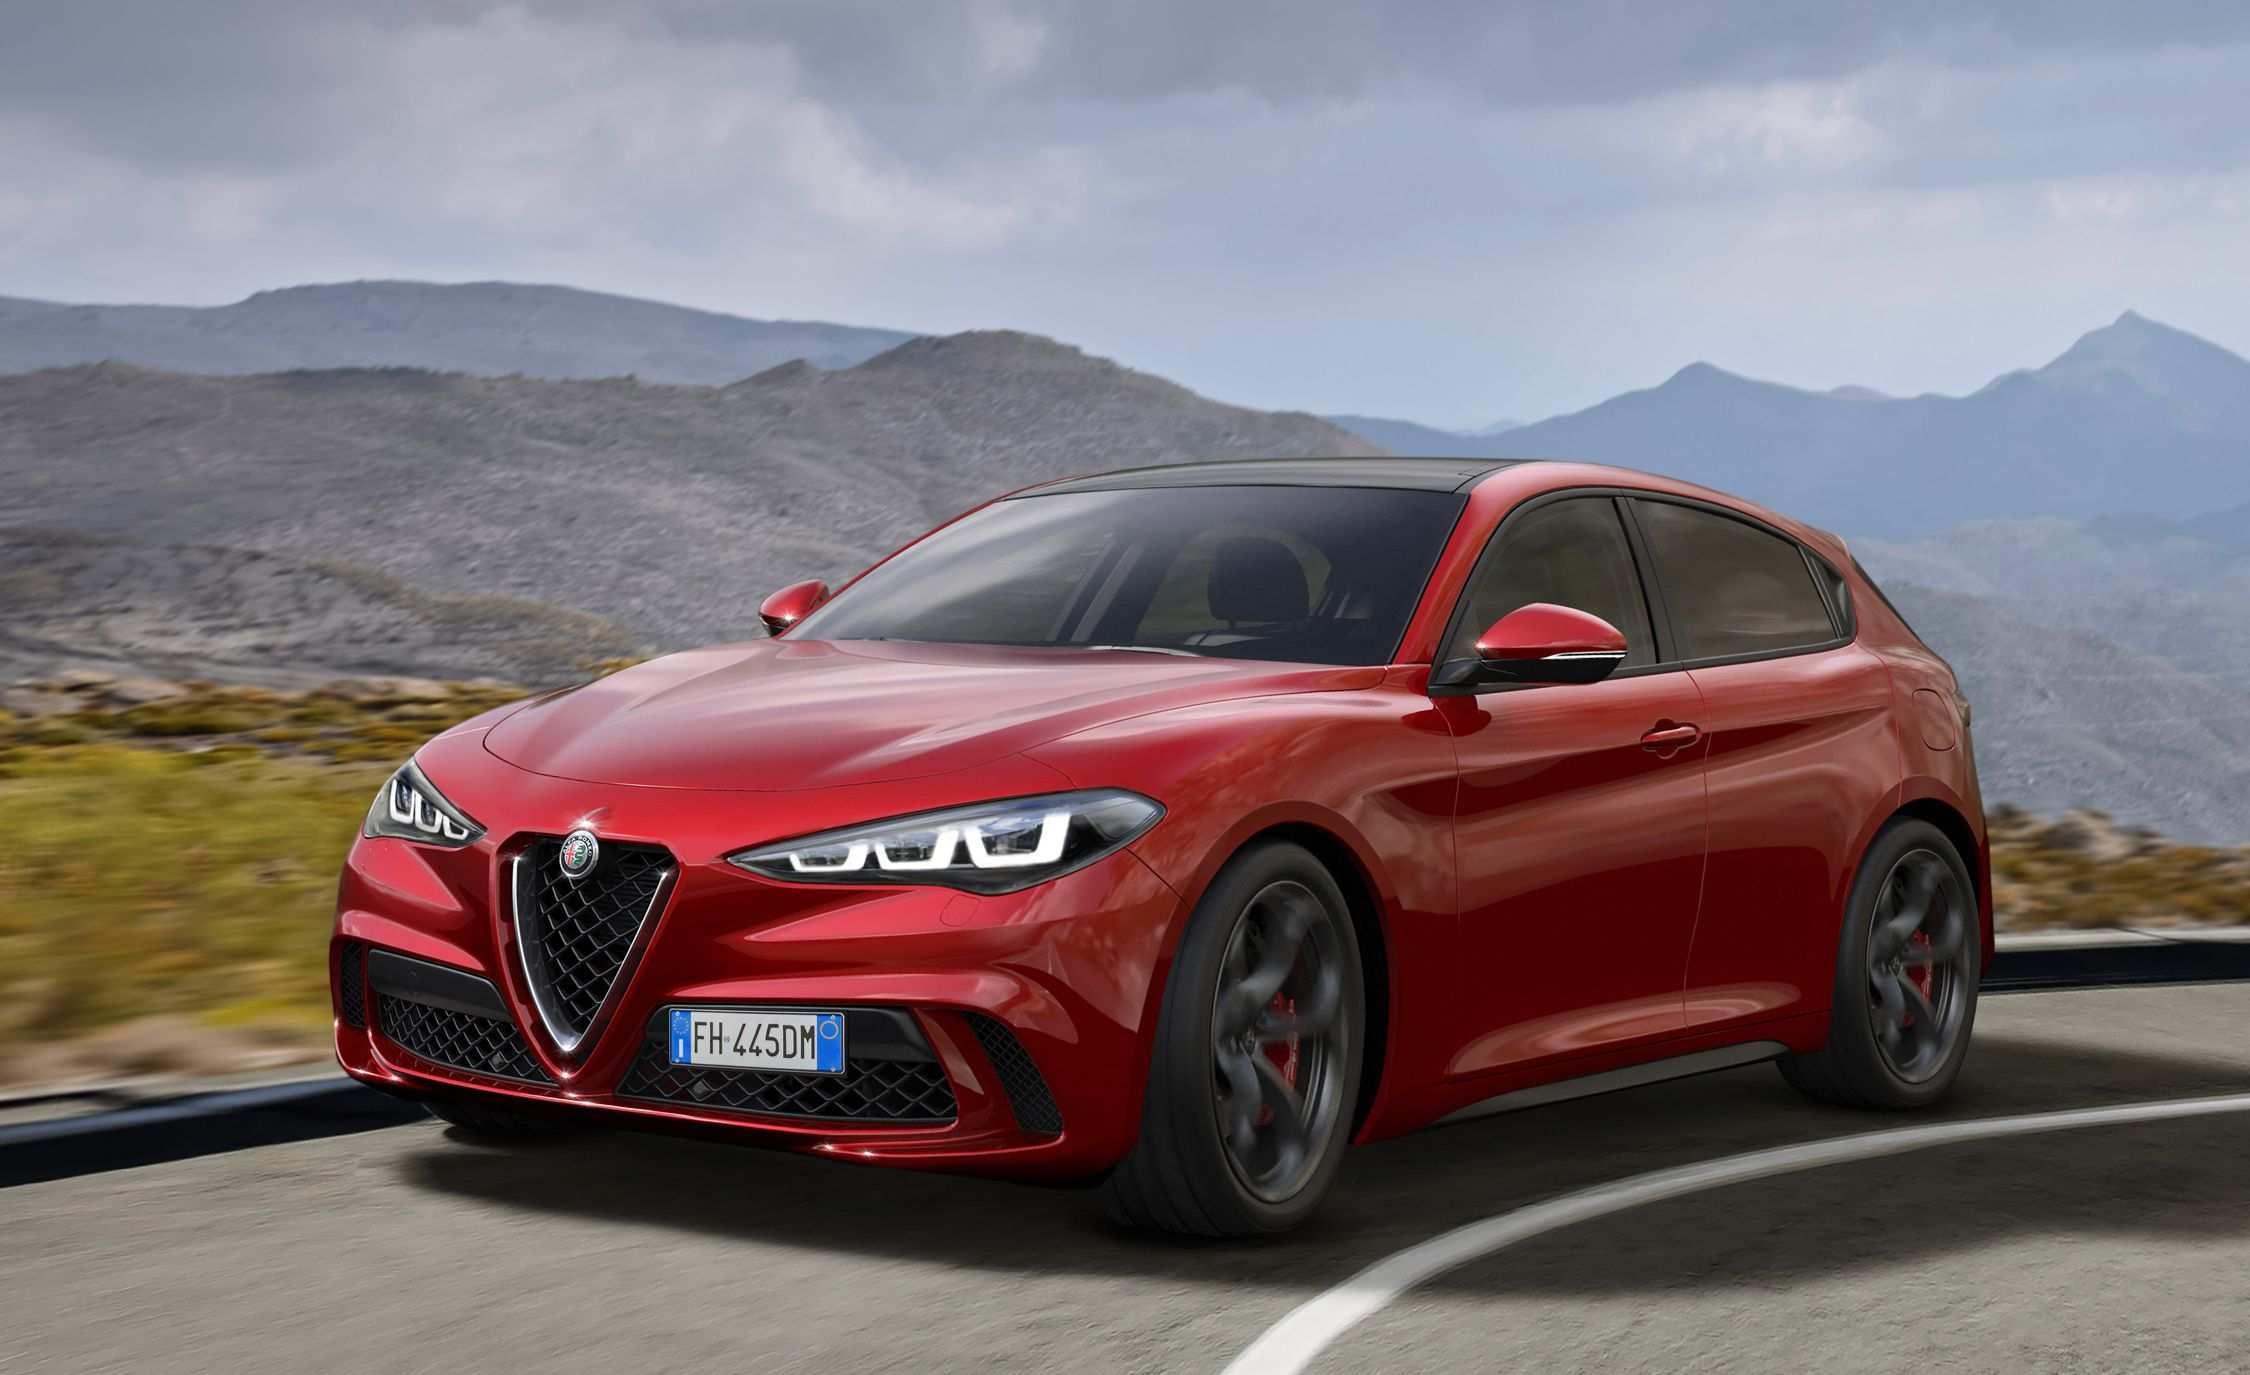 26 Best Review 2019 Alfa Romeo Giulietta Model for 2019 Alfa Romeo Giulietta